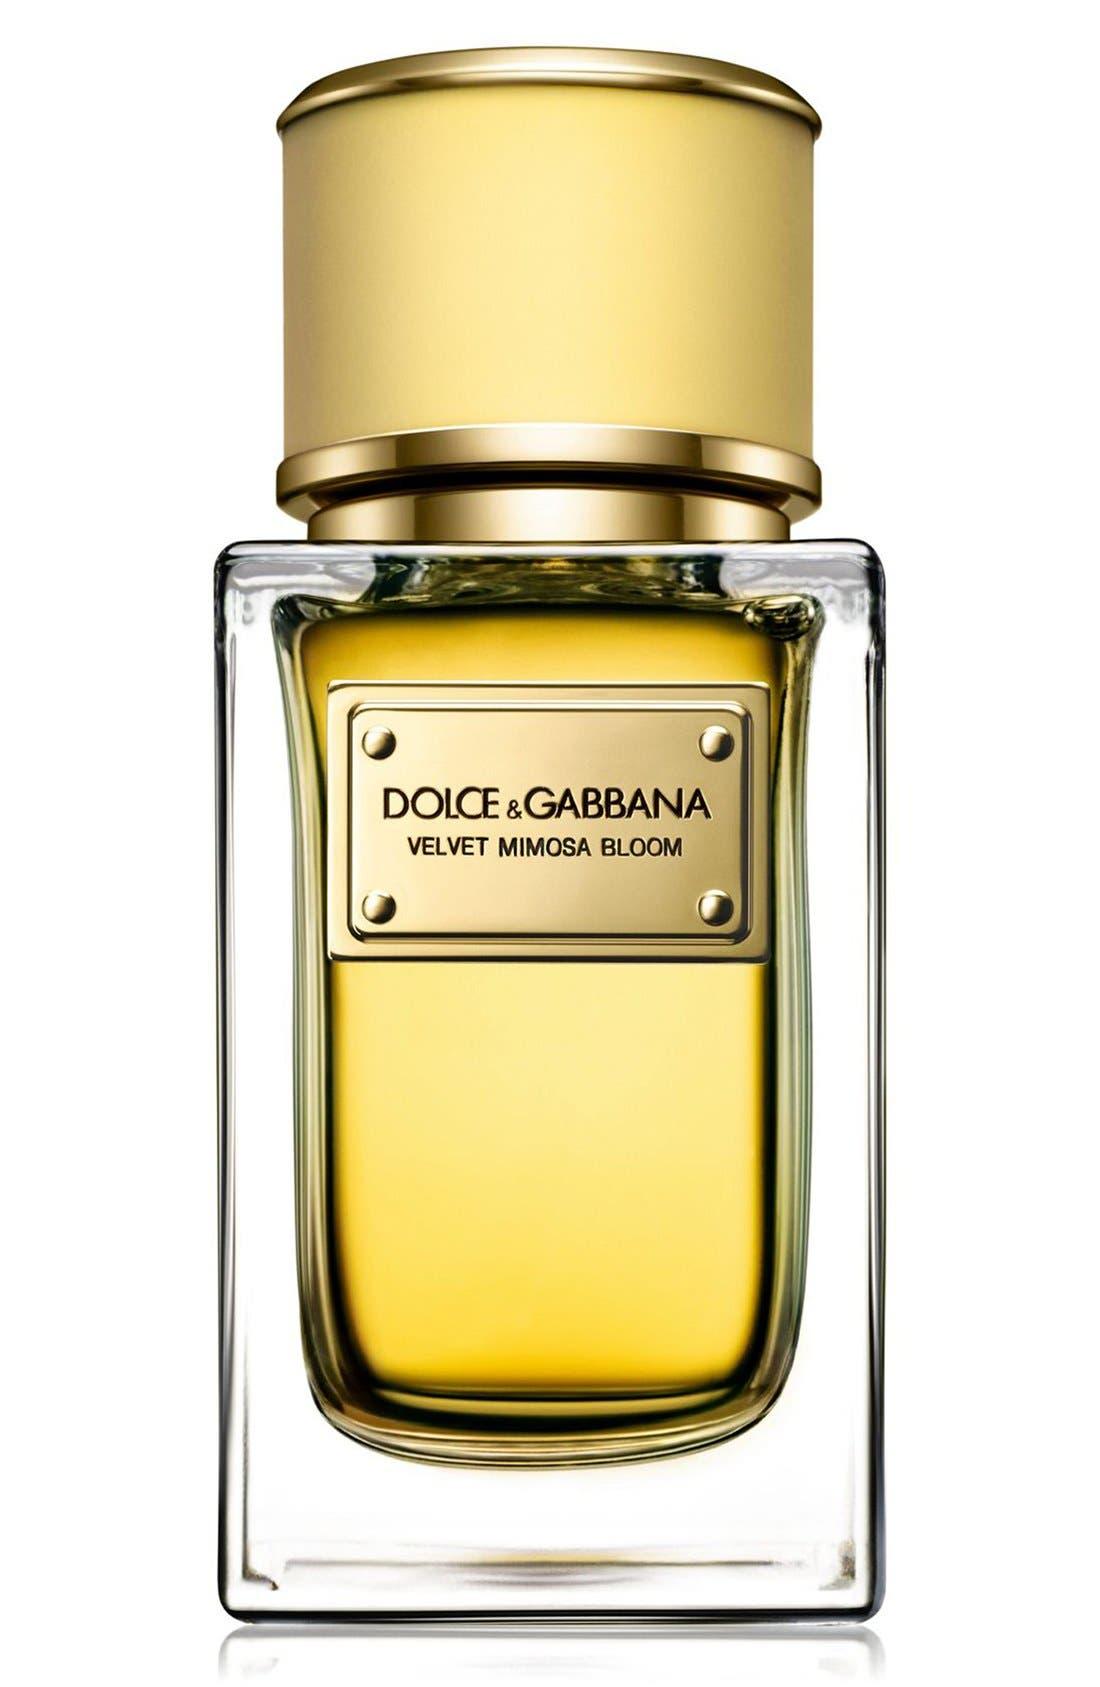 Dolce&Gabbana Beauty 'Velvet Mimosa Bloom' Eau de Parfum